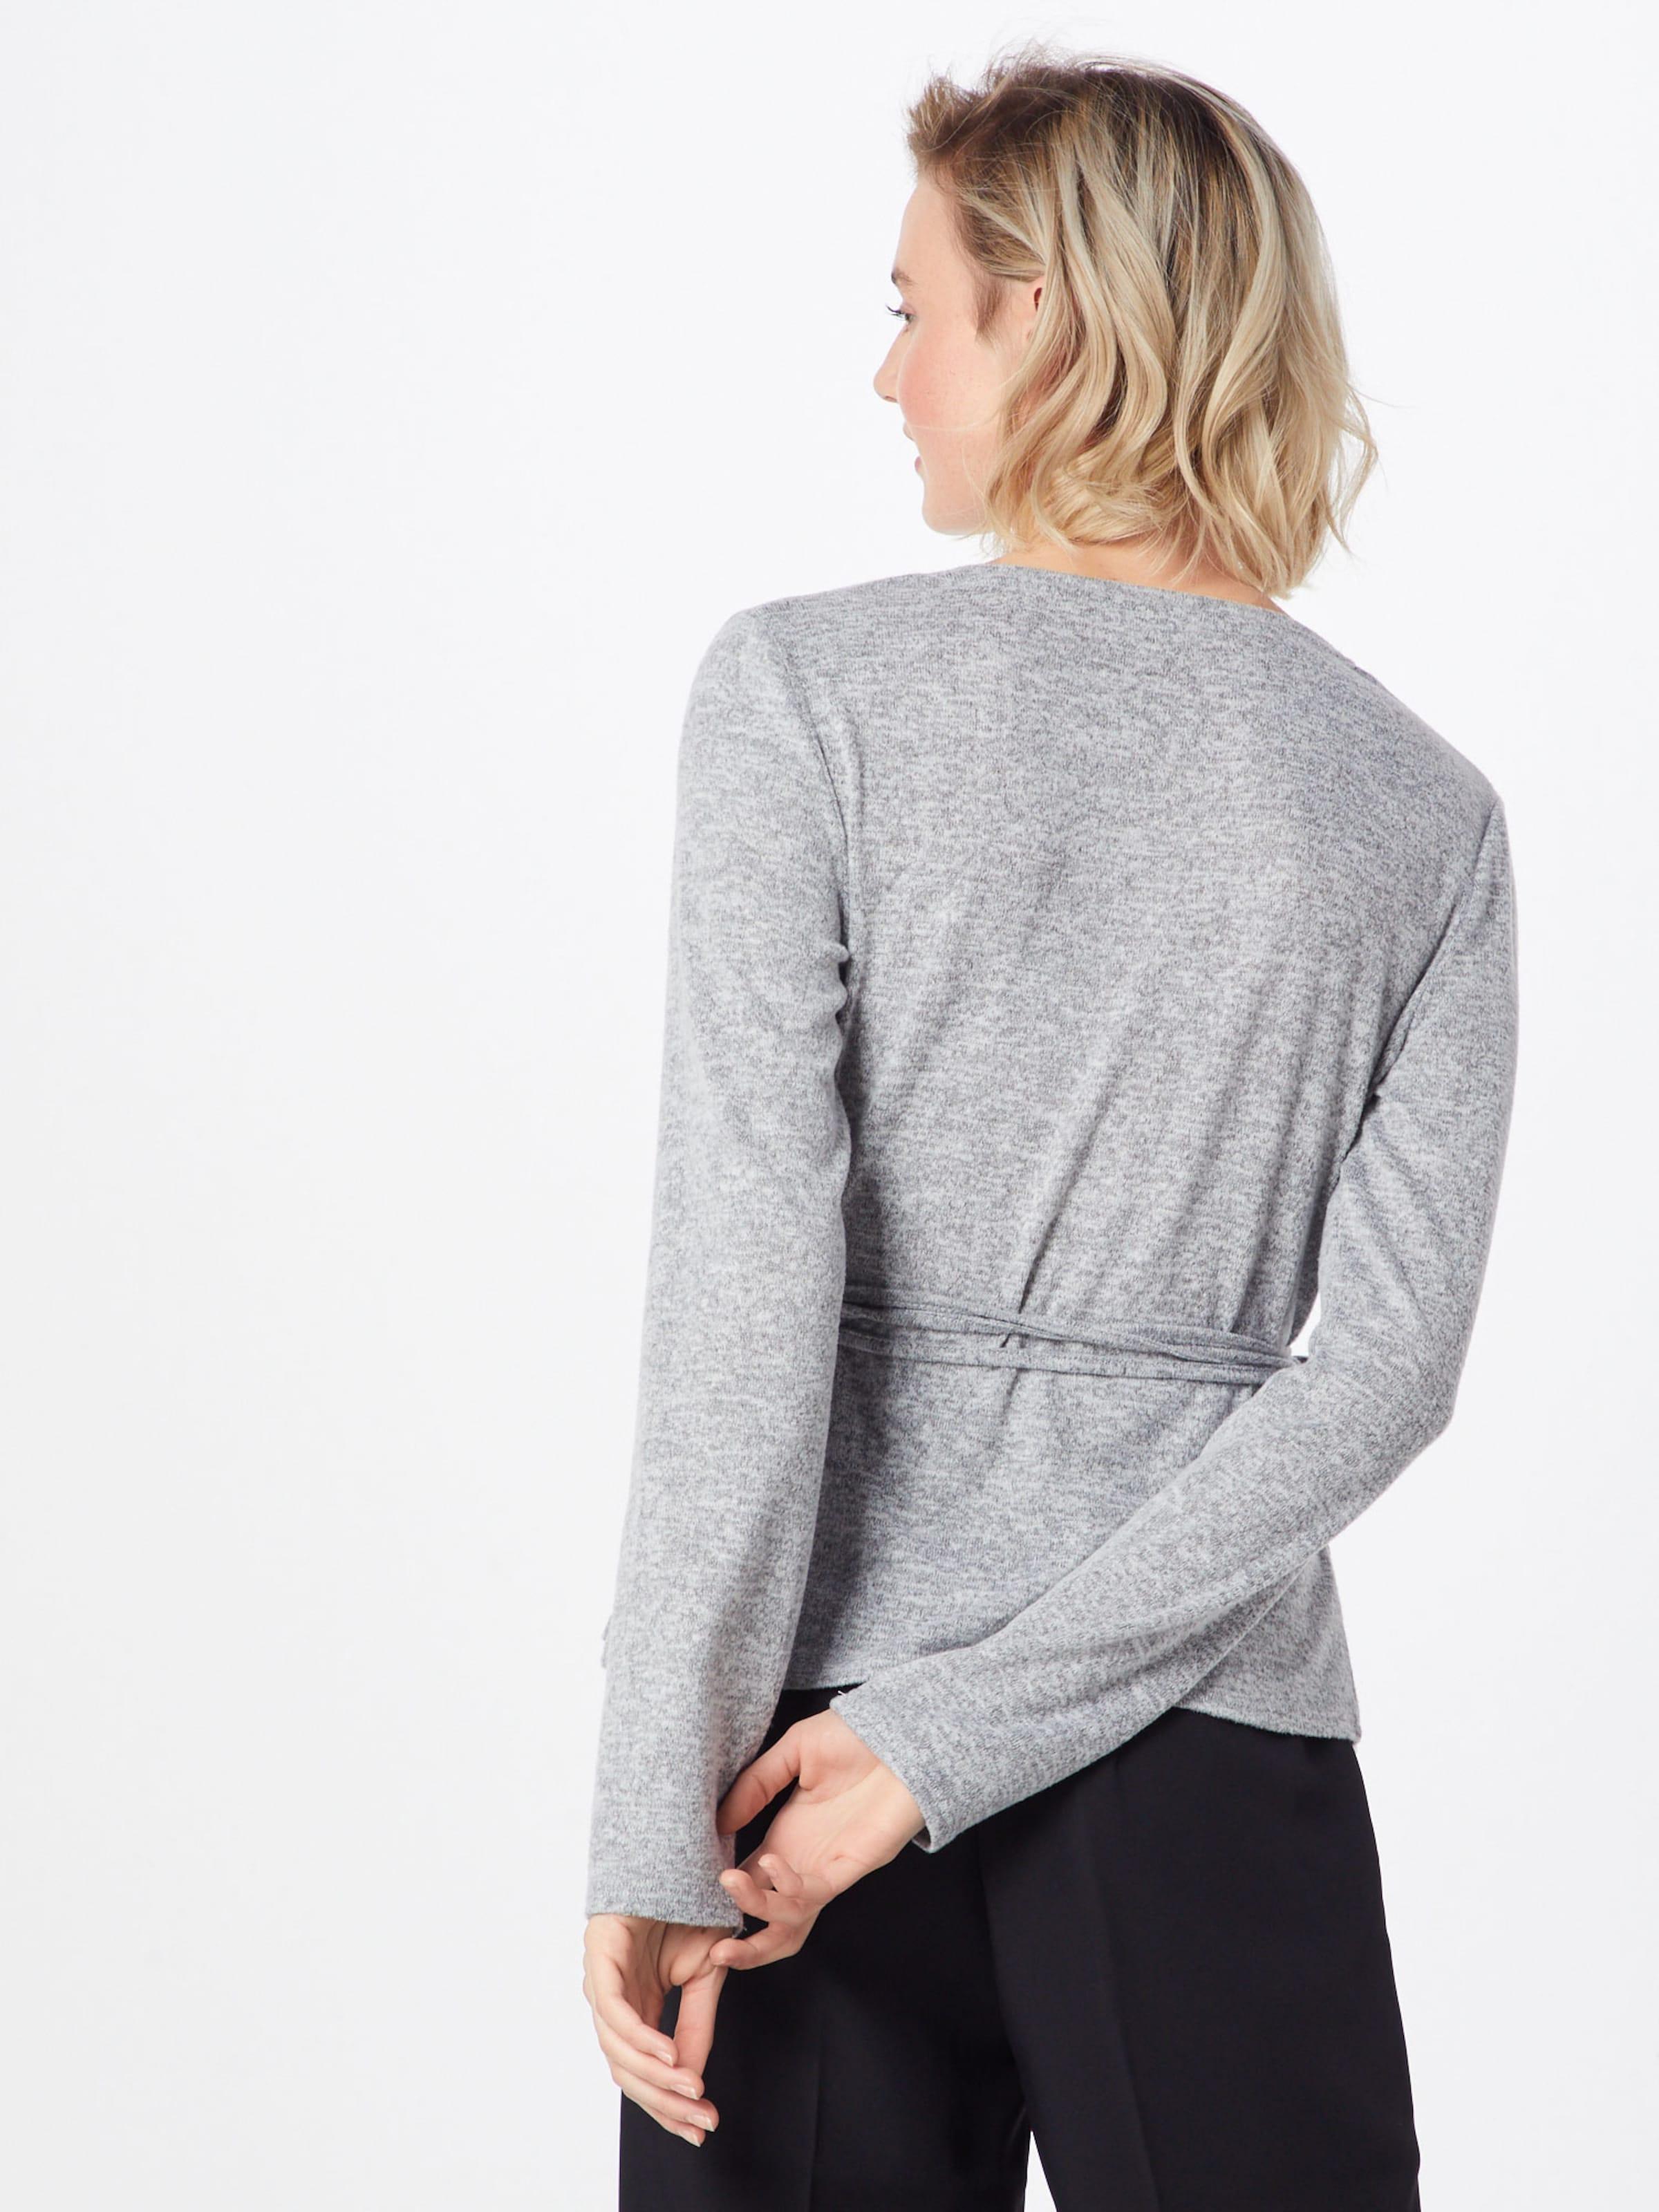 'sendola' Graumeliert Opus Pullover In ZiPXku